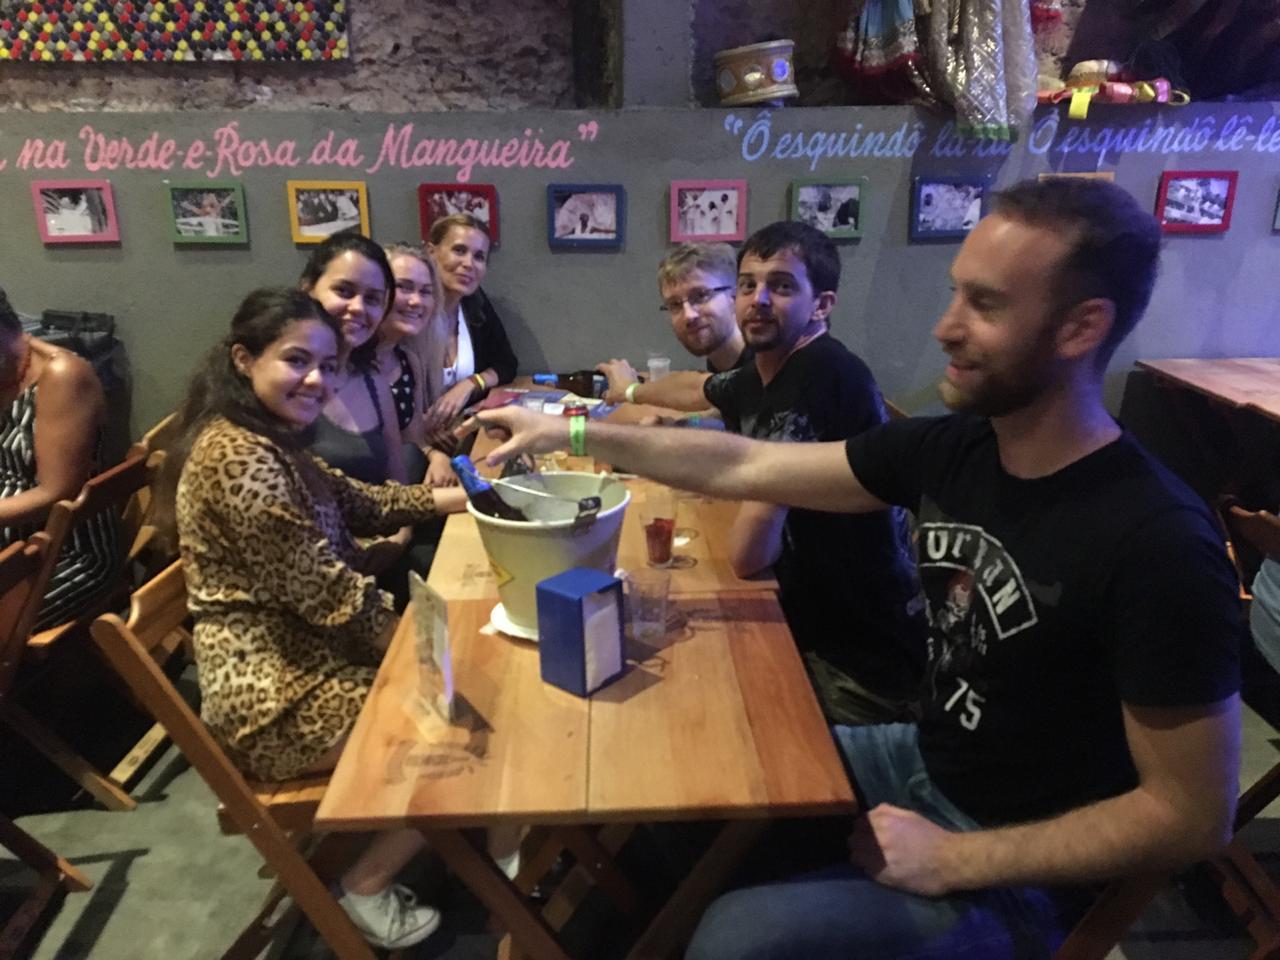 students drinking beer at the bar.